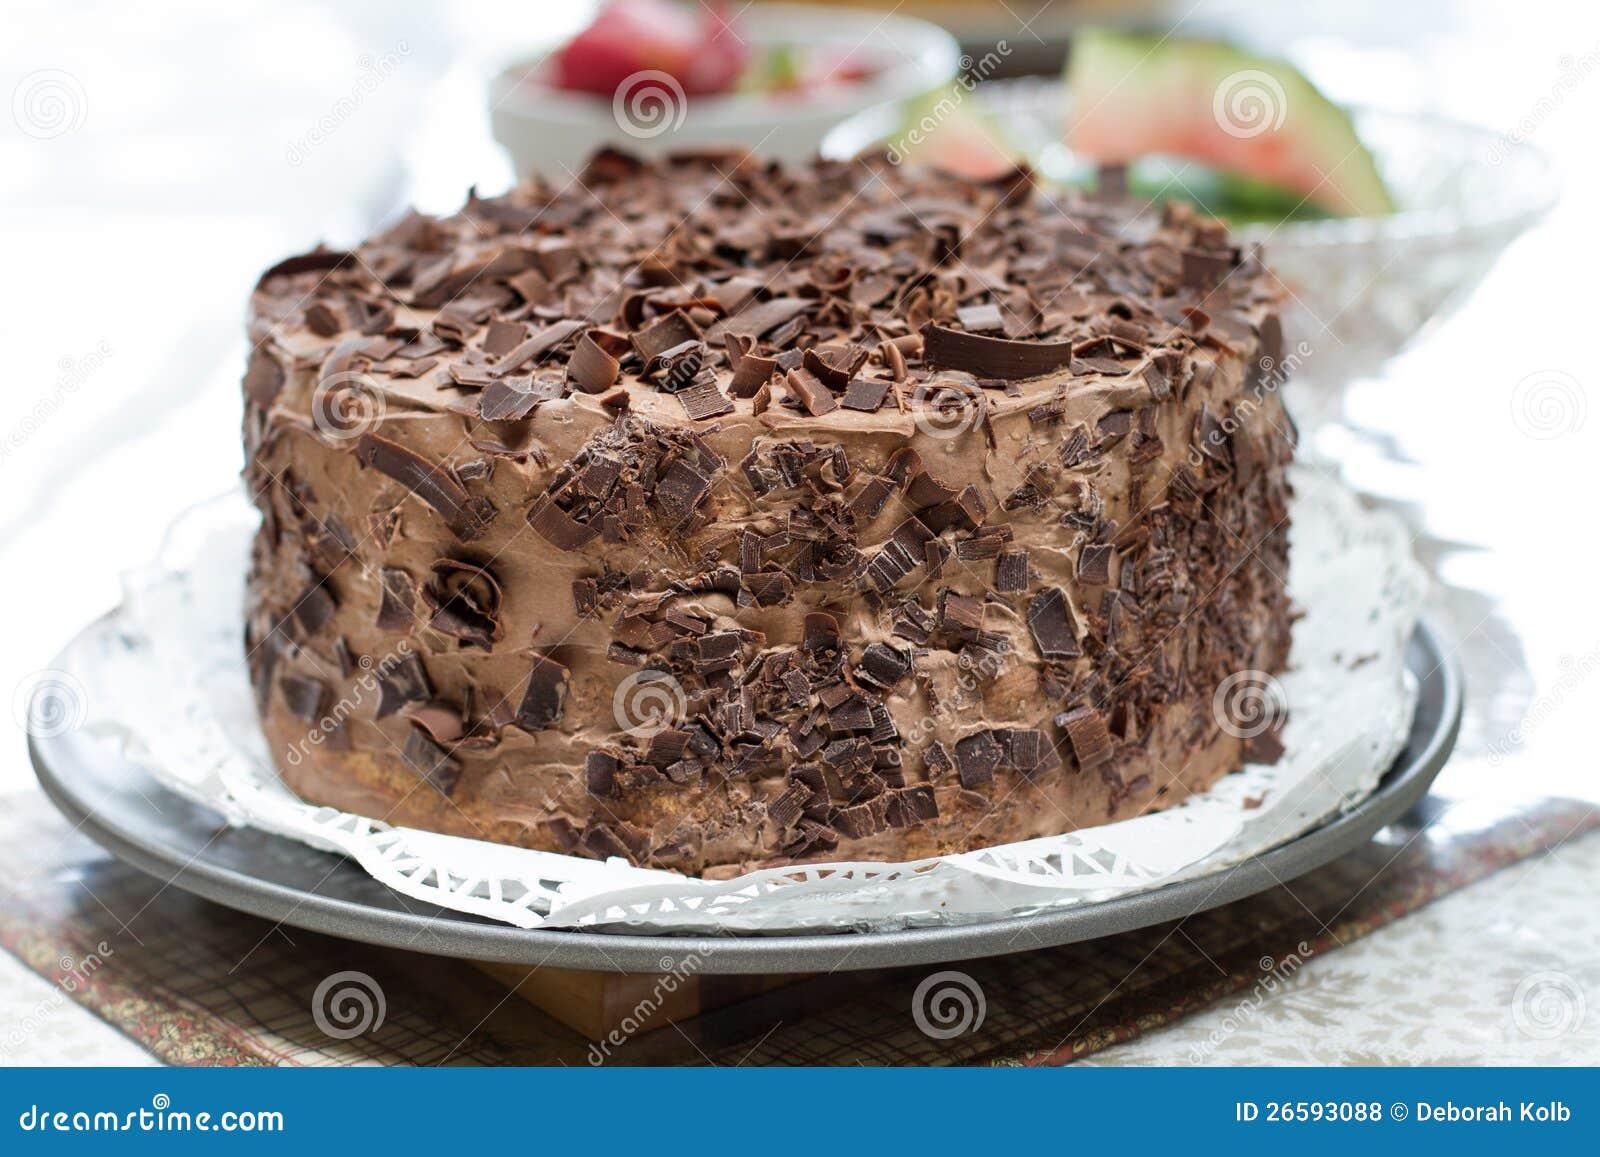 Homemade Skinny Chocolate Cake Recipes — Dishmaps